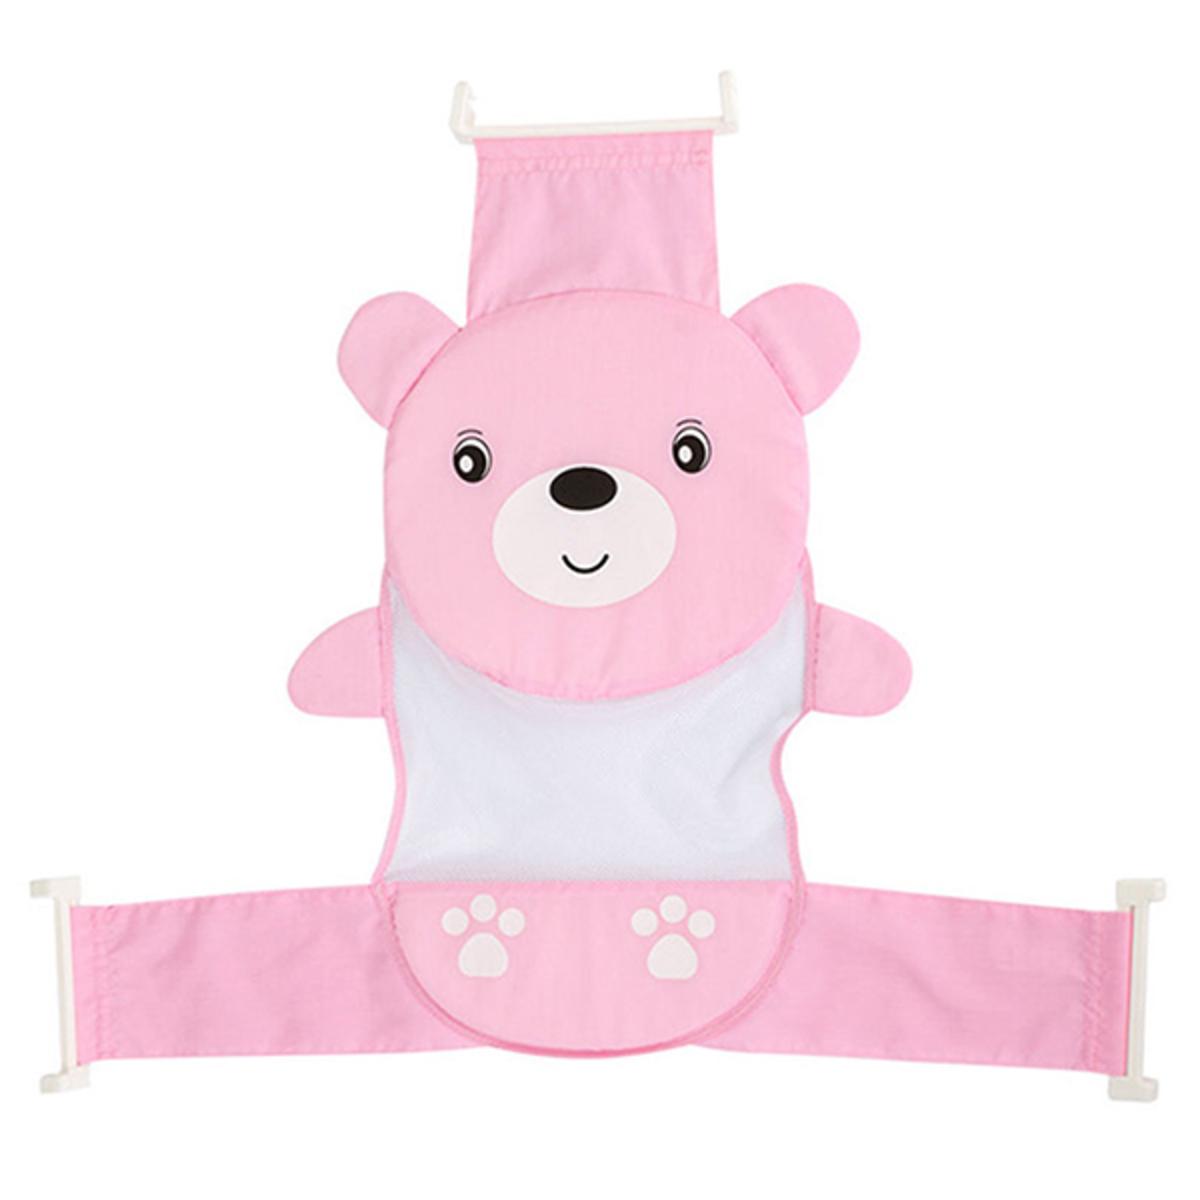 Baby Bathtub Seat Support | Go Shop